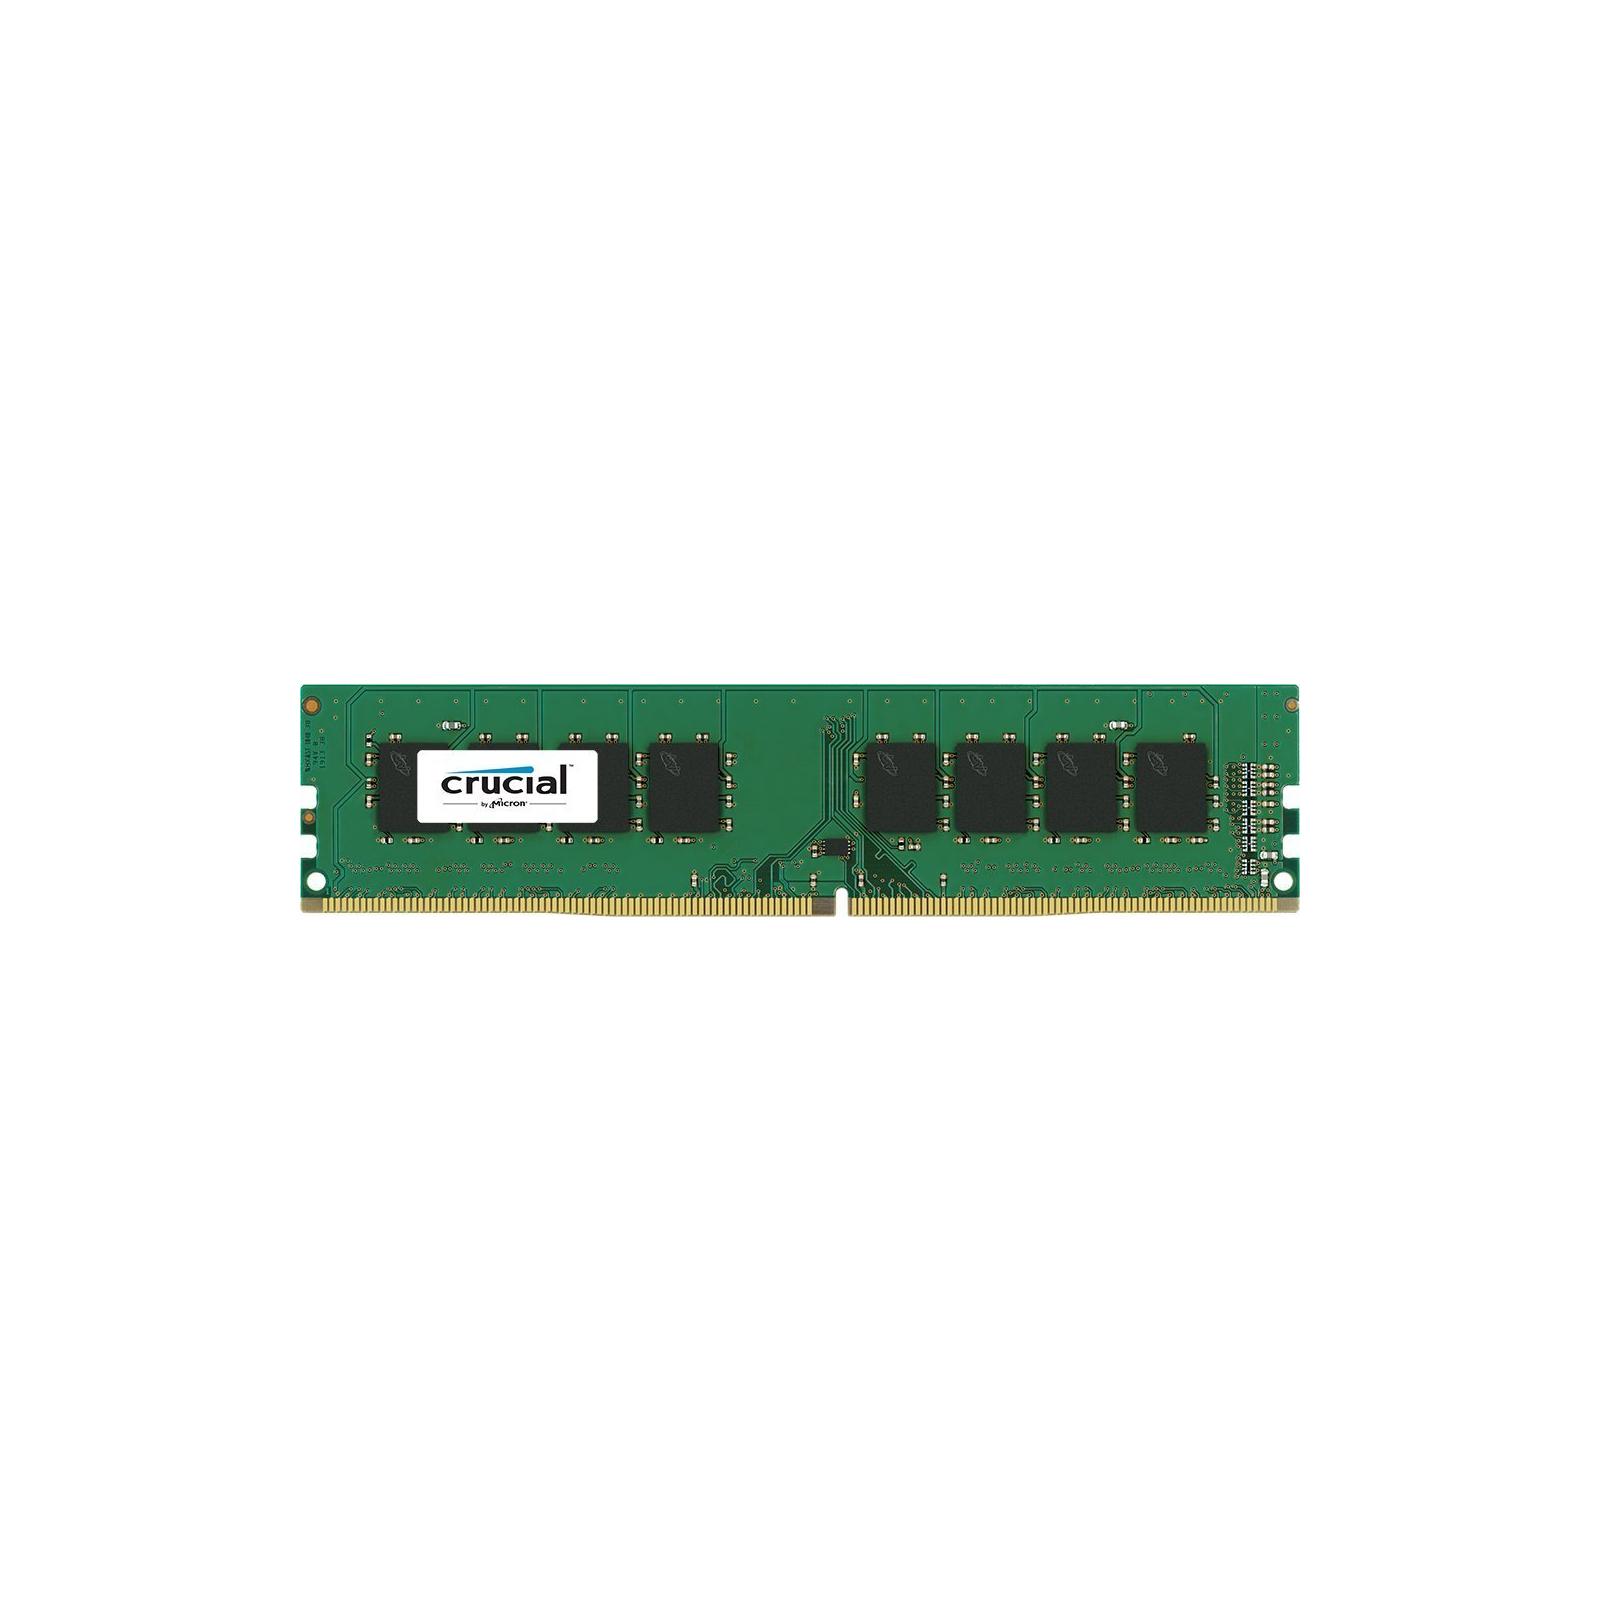 Модуль памяти для компьютера DDR4 16GB 2133 MHz MICRON (CT16G4DFD8213)